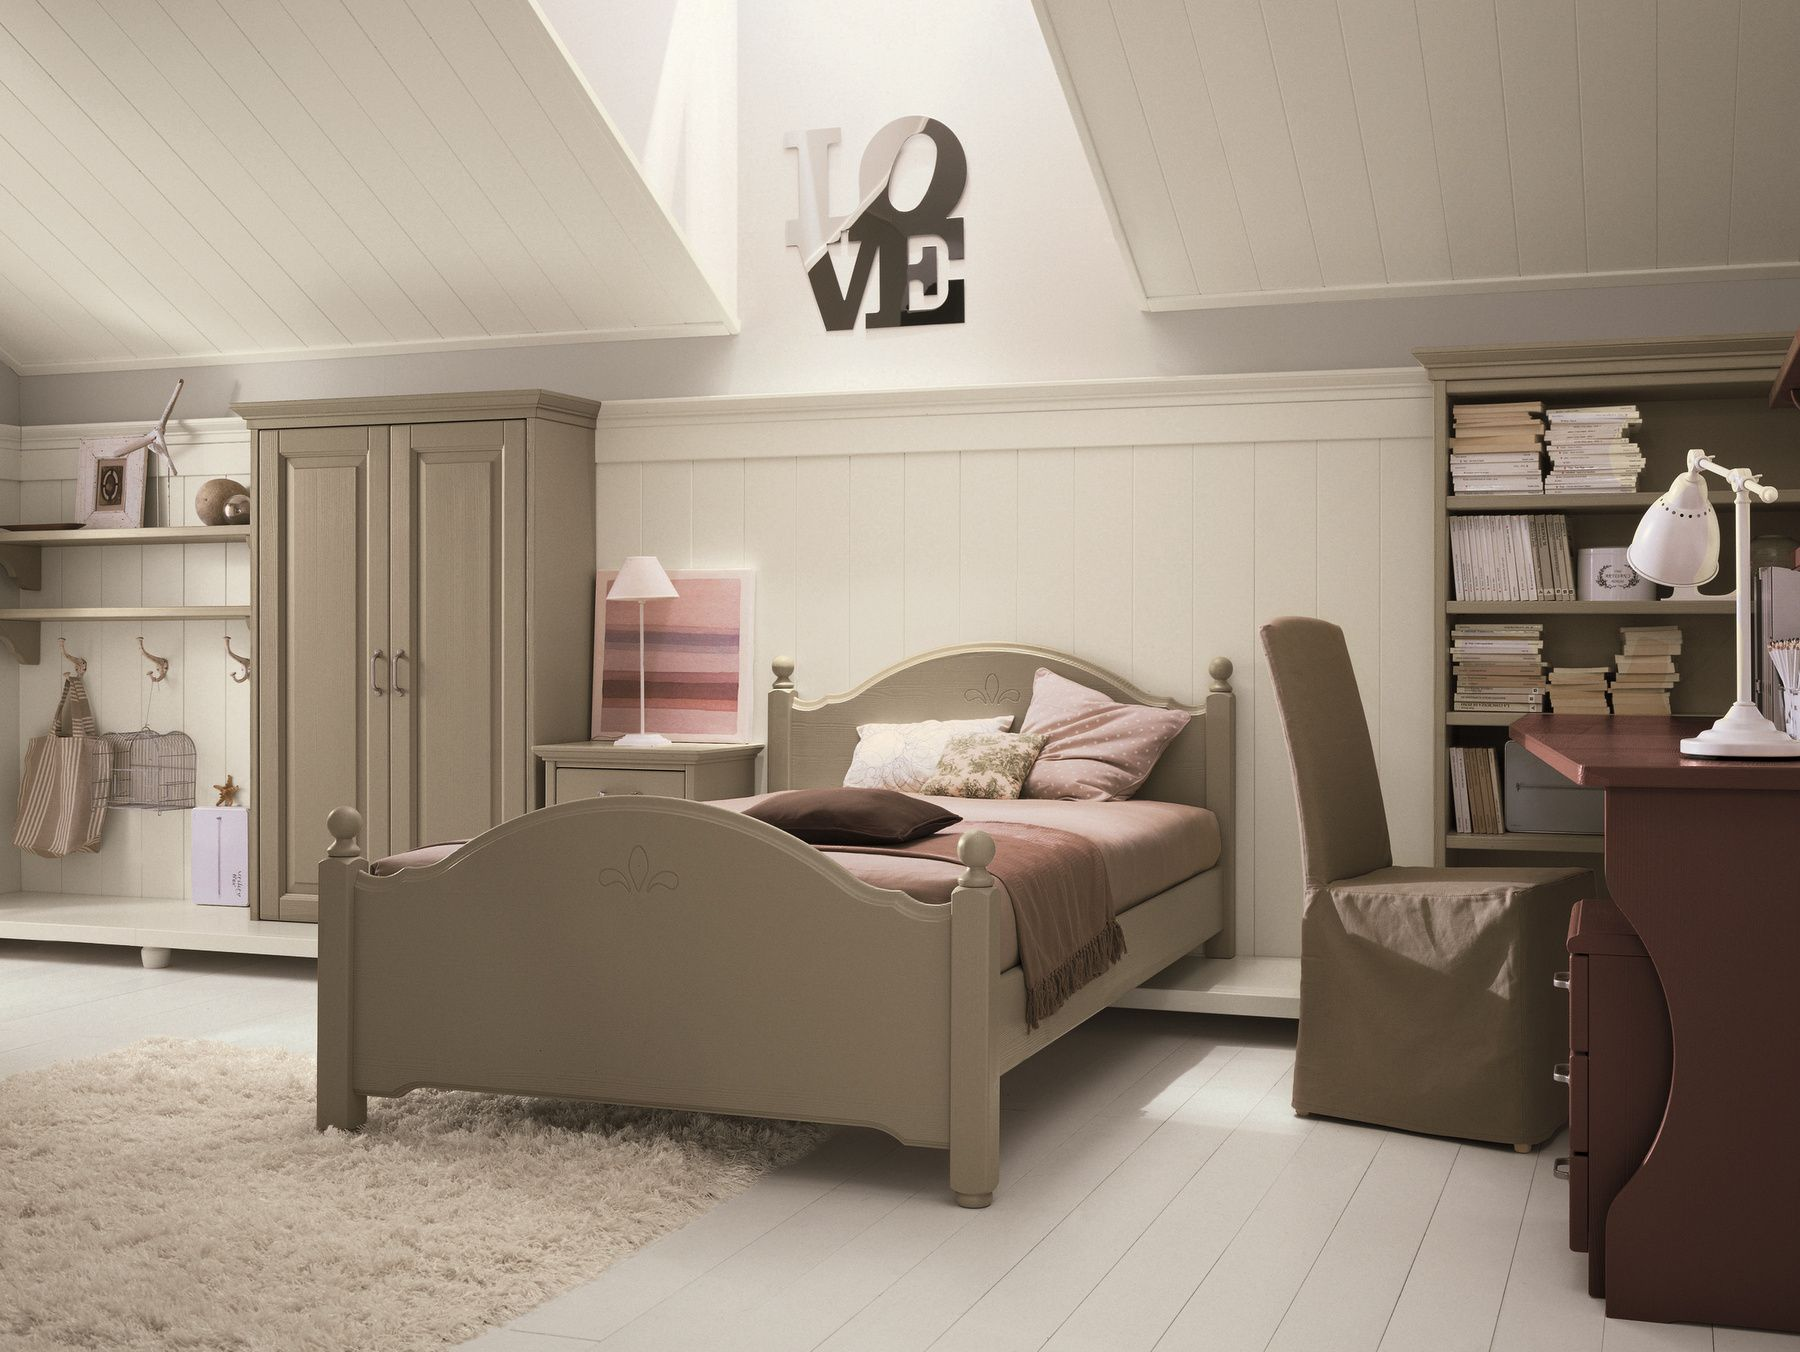 Camerette effedue ~ Camerette classiche child room composition